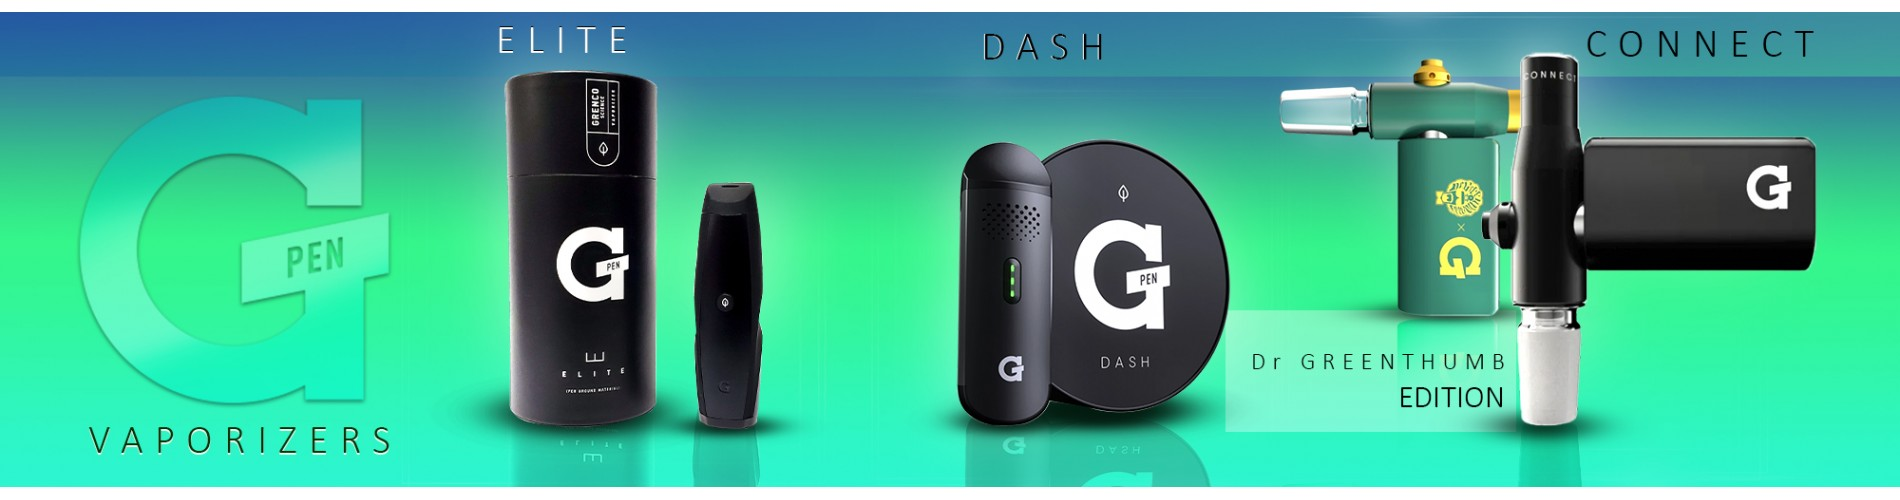 G-Pen Vaporizers, Elite, Dash and Connect